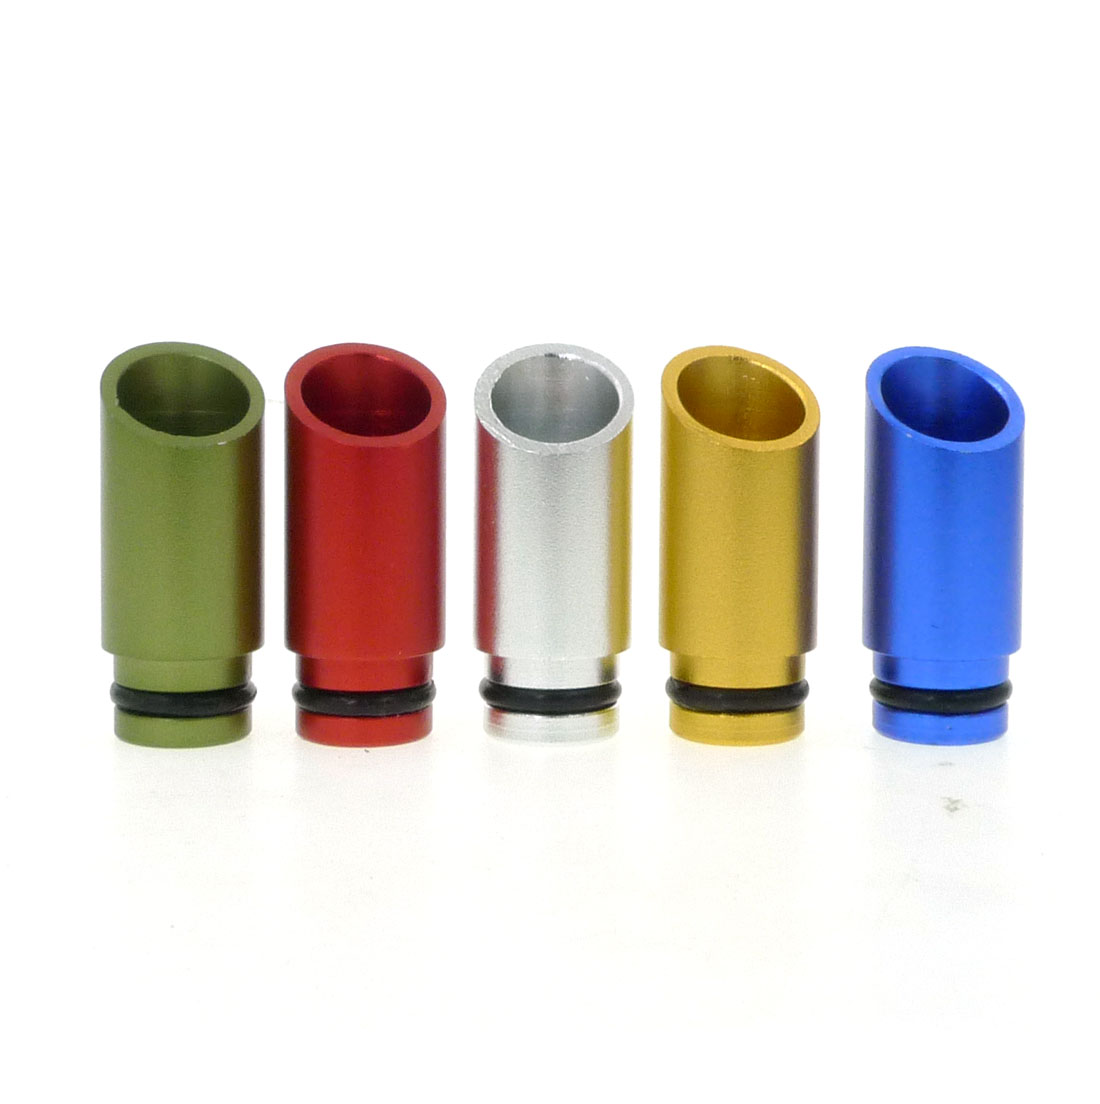 Metal Aluminum Drip Tips Oblique Mouthpiece 510 Thread DripTip For Vape ATTY RDA RBA Mechanical Rebuildable Dripping Atomizer